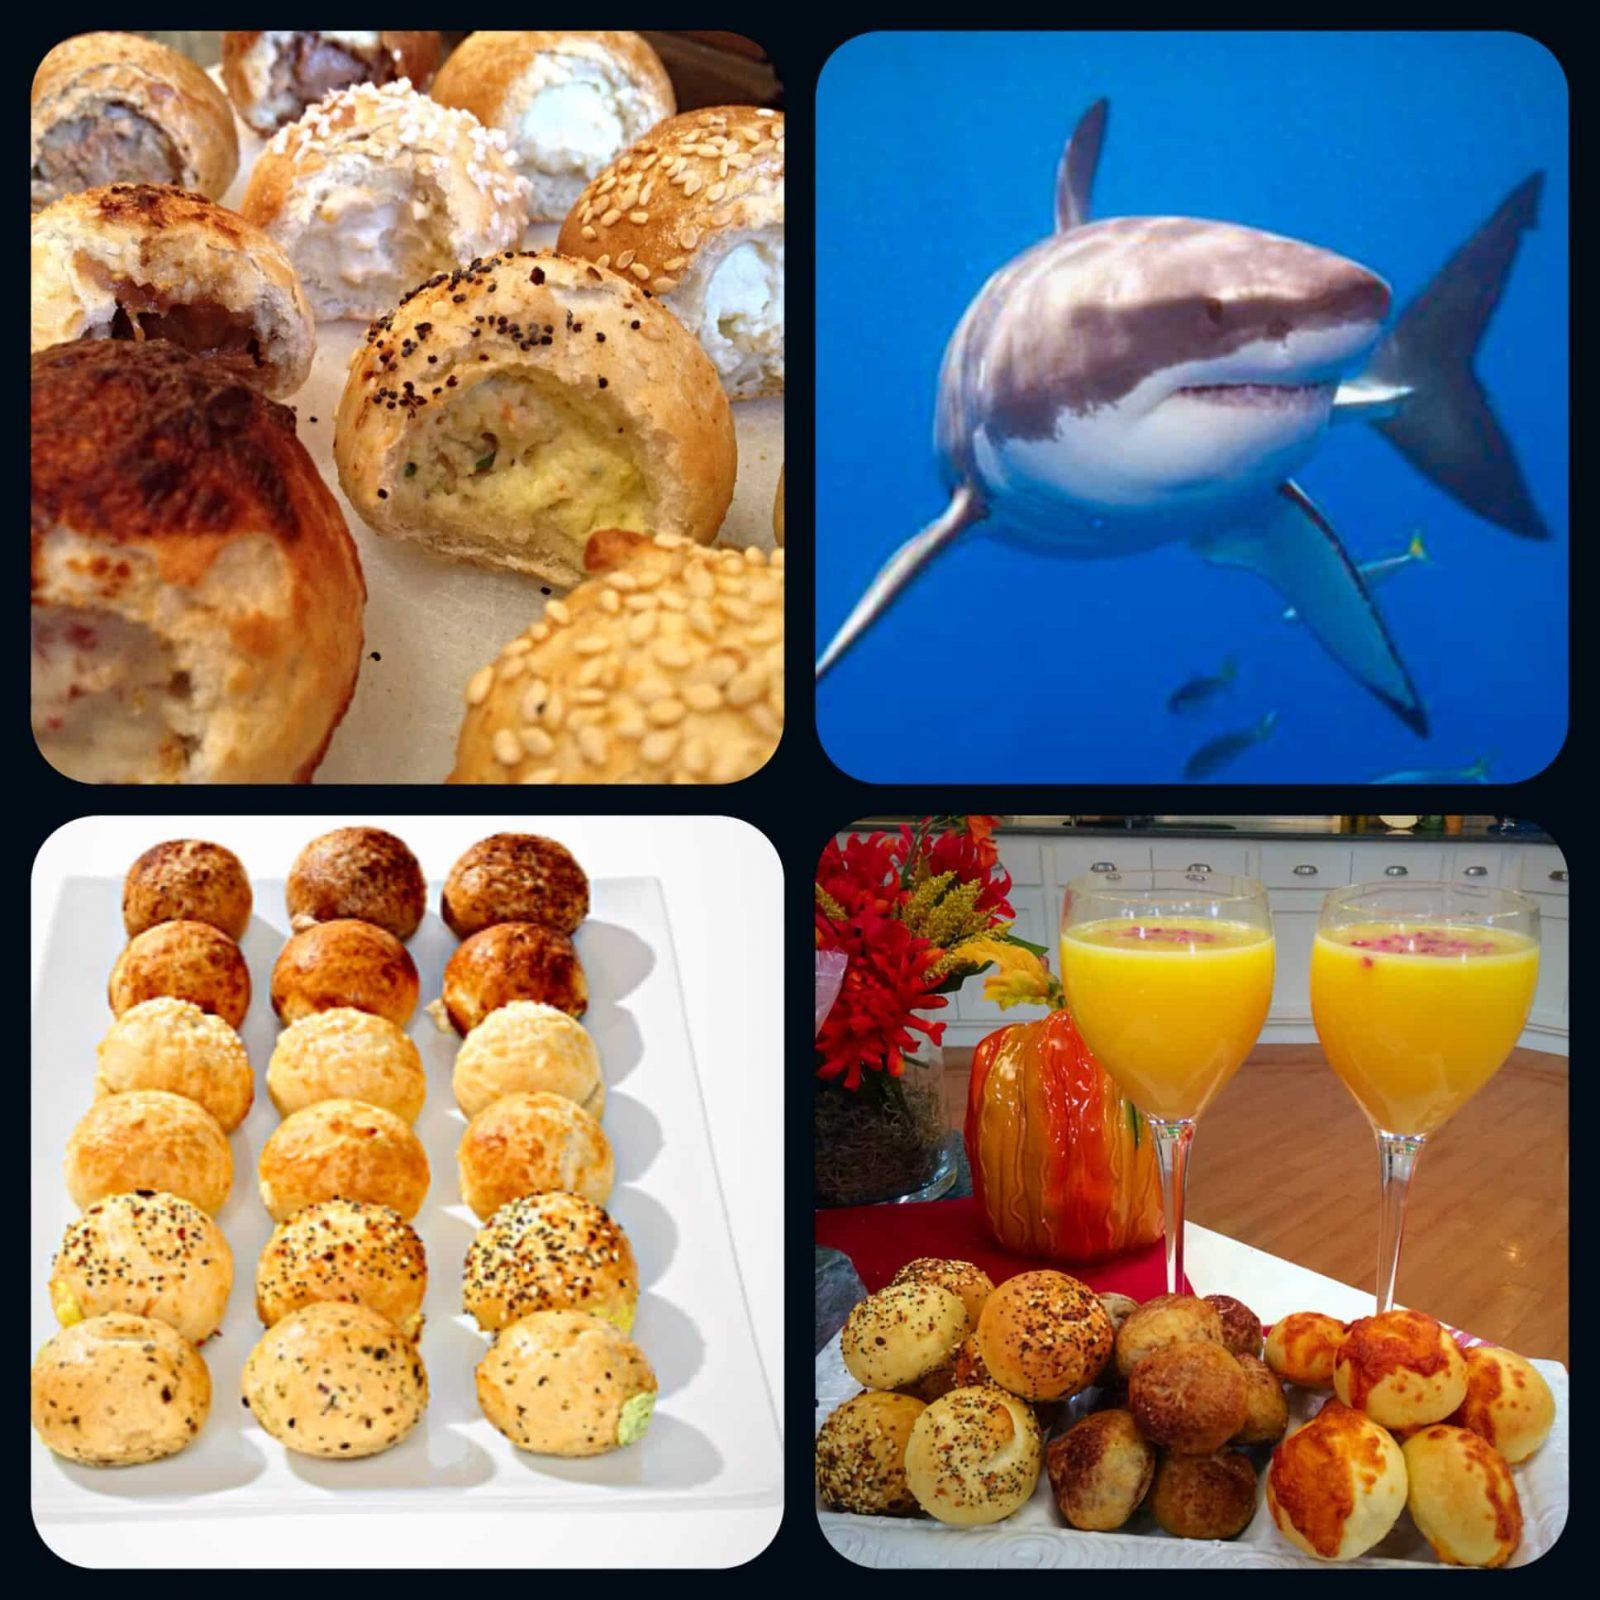 Bantam Bagels | Bagel Stuffins Mini Cream Cheese Stuffed Bagel Balls On Shark Tank